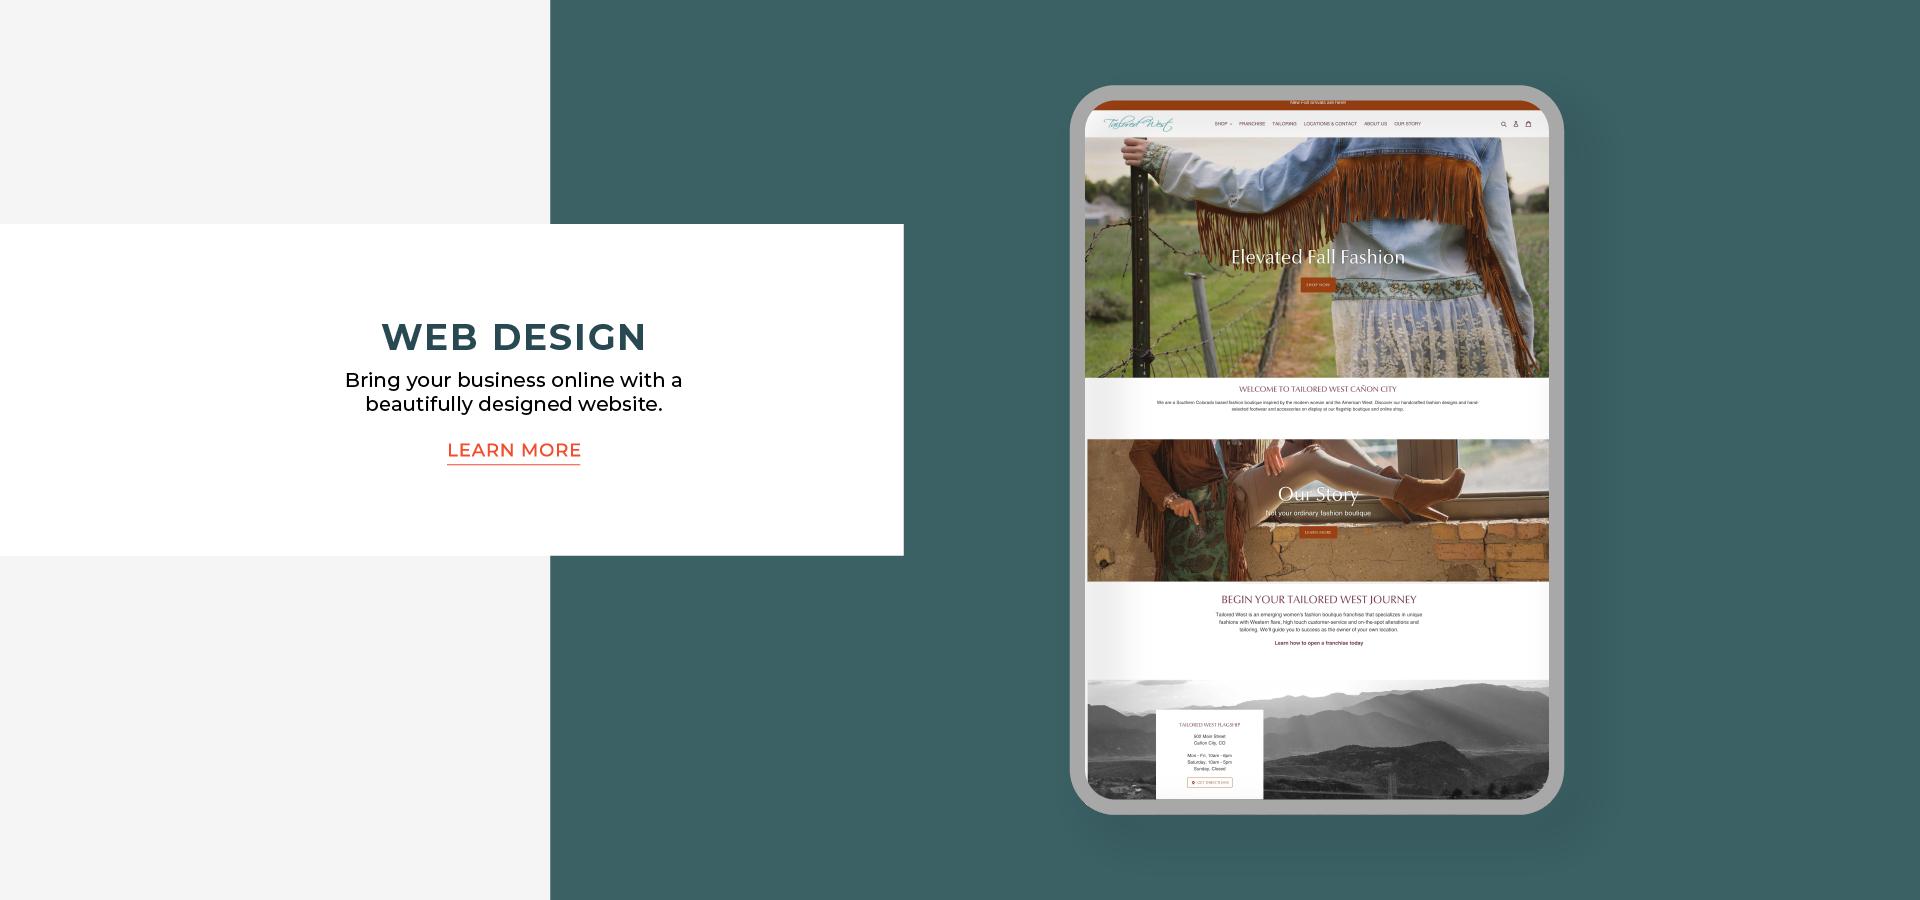 kat fox design website design services